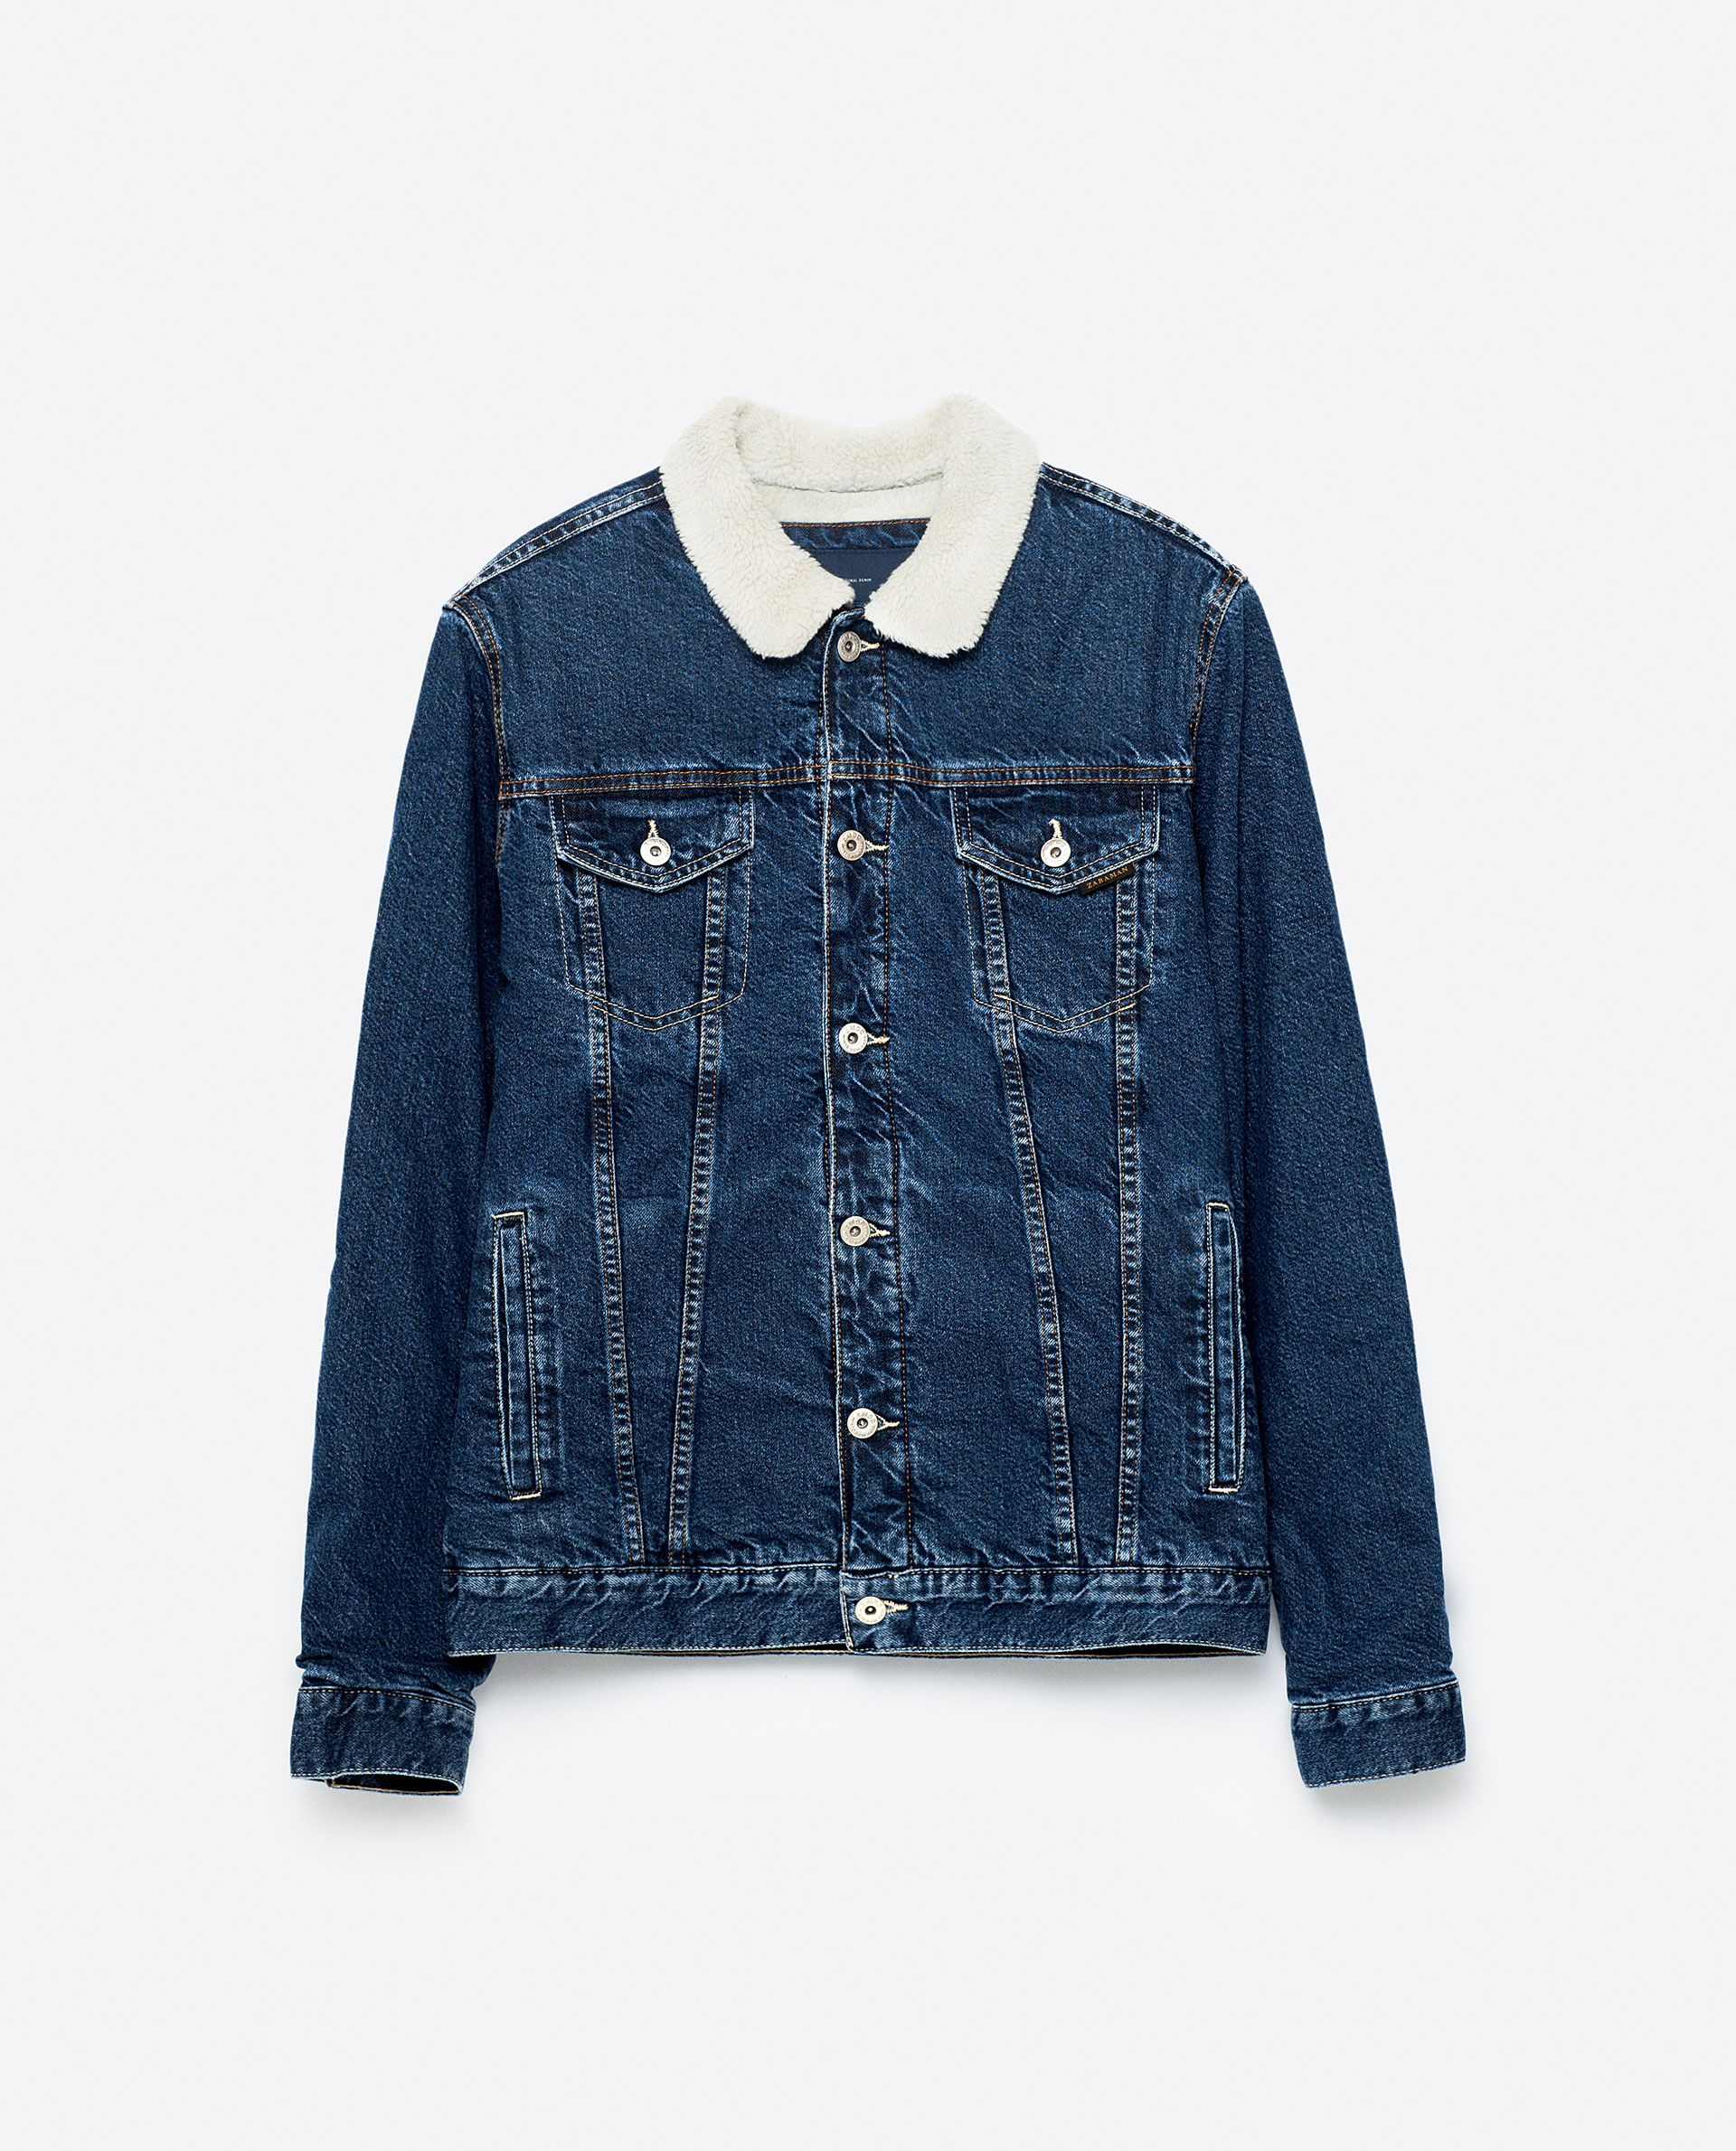 CAZADORA DENIM BORREGO Denim Jacket With Dress, Jacket Dress, Sheepskin  Jacket, Denim Jackets b97d75519260